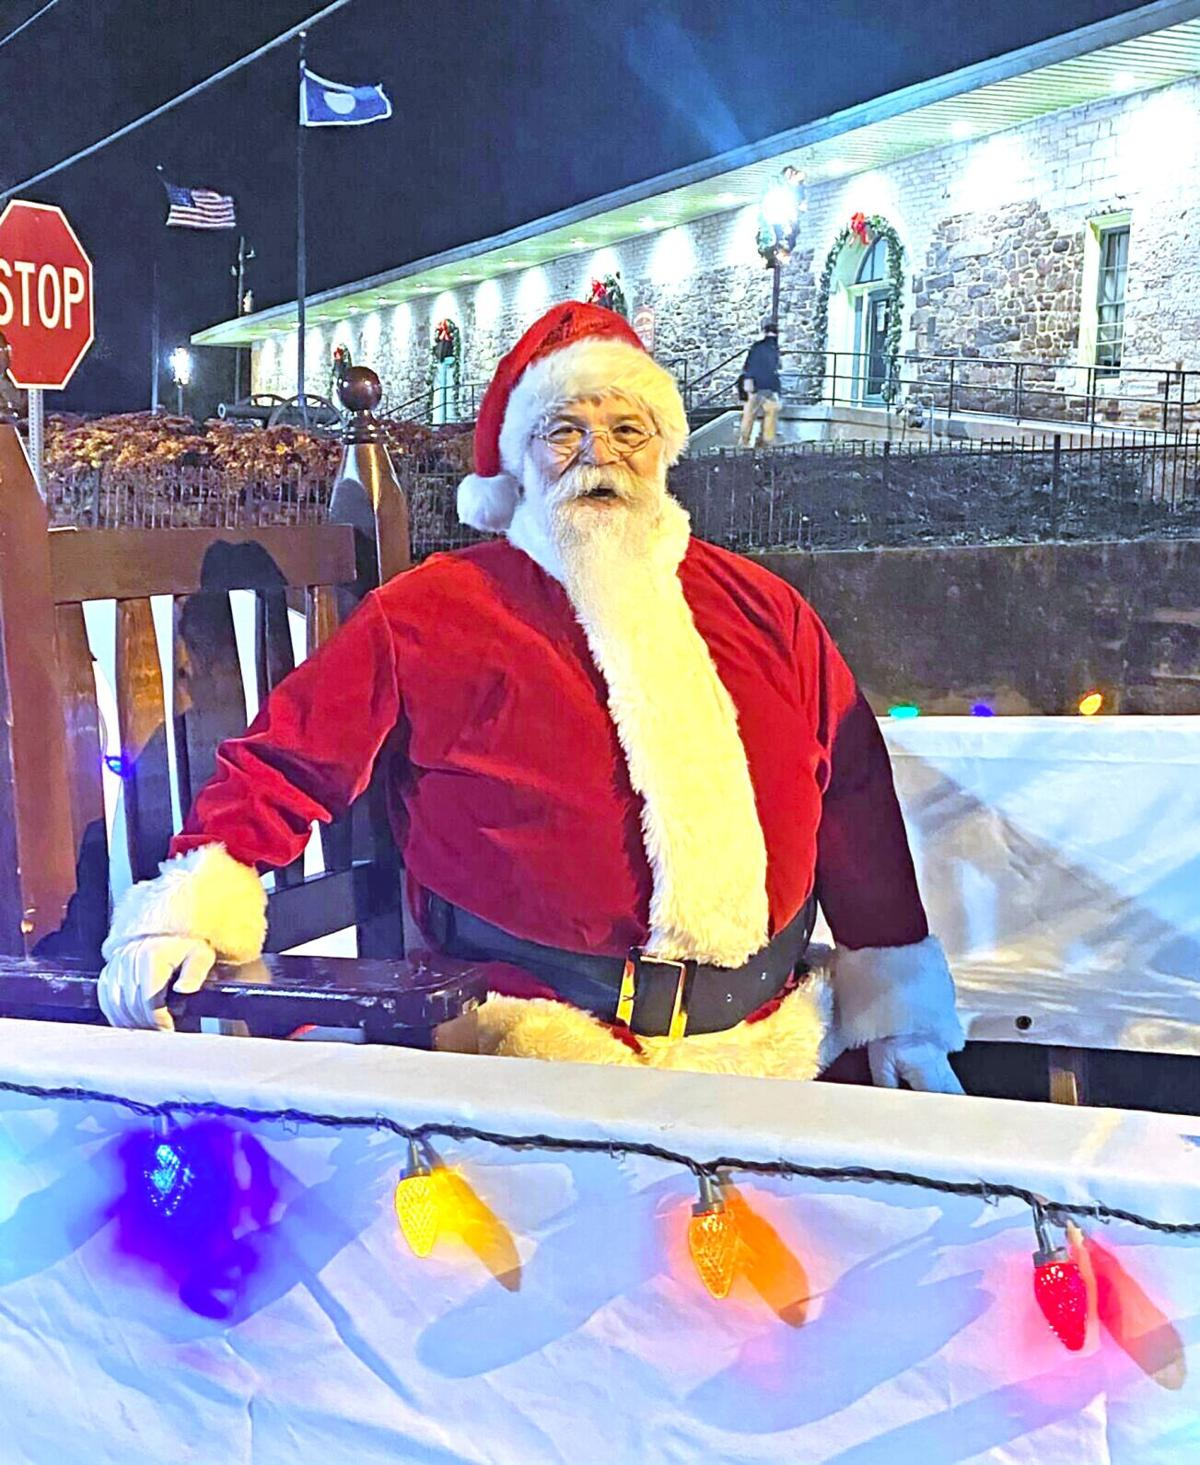 Depot Santa